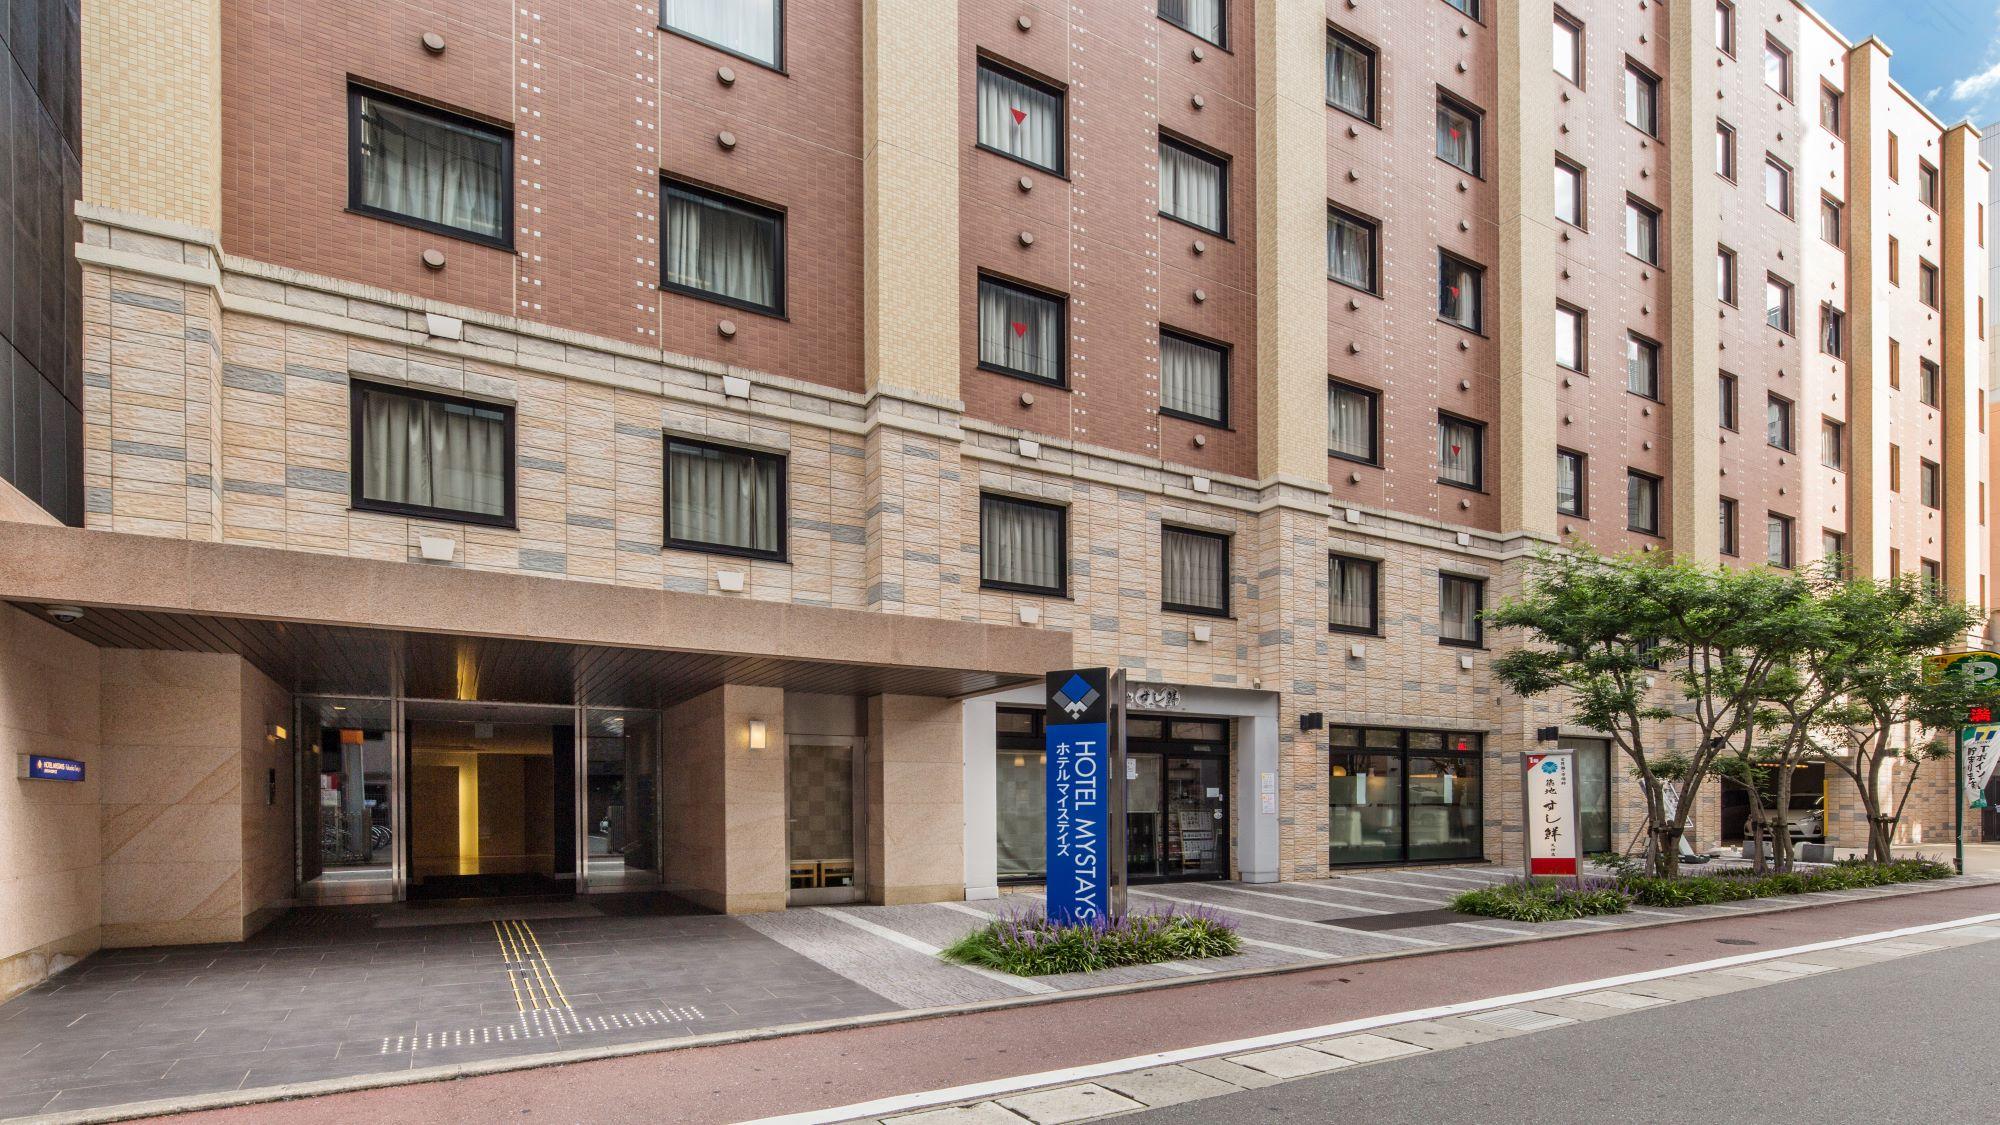 ecd696d377 ホテルマイステイズ福岡天神 2008年10月オープン!天神駅より徒歩3分。上品かつ気品あふれる空間で、くつろぎと快適さをお届けいたします。